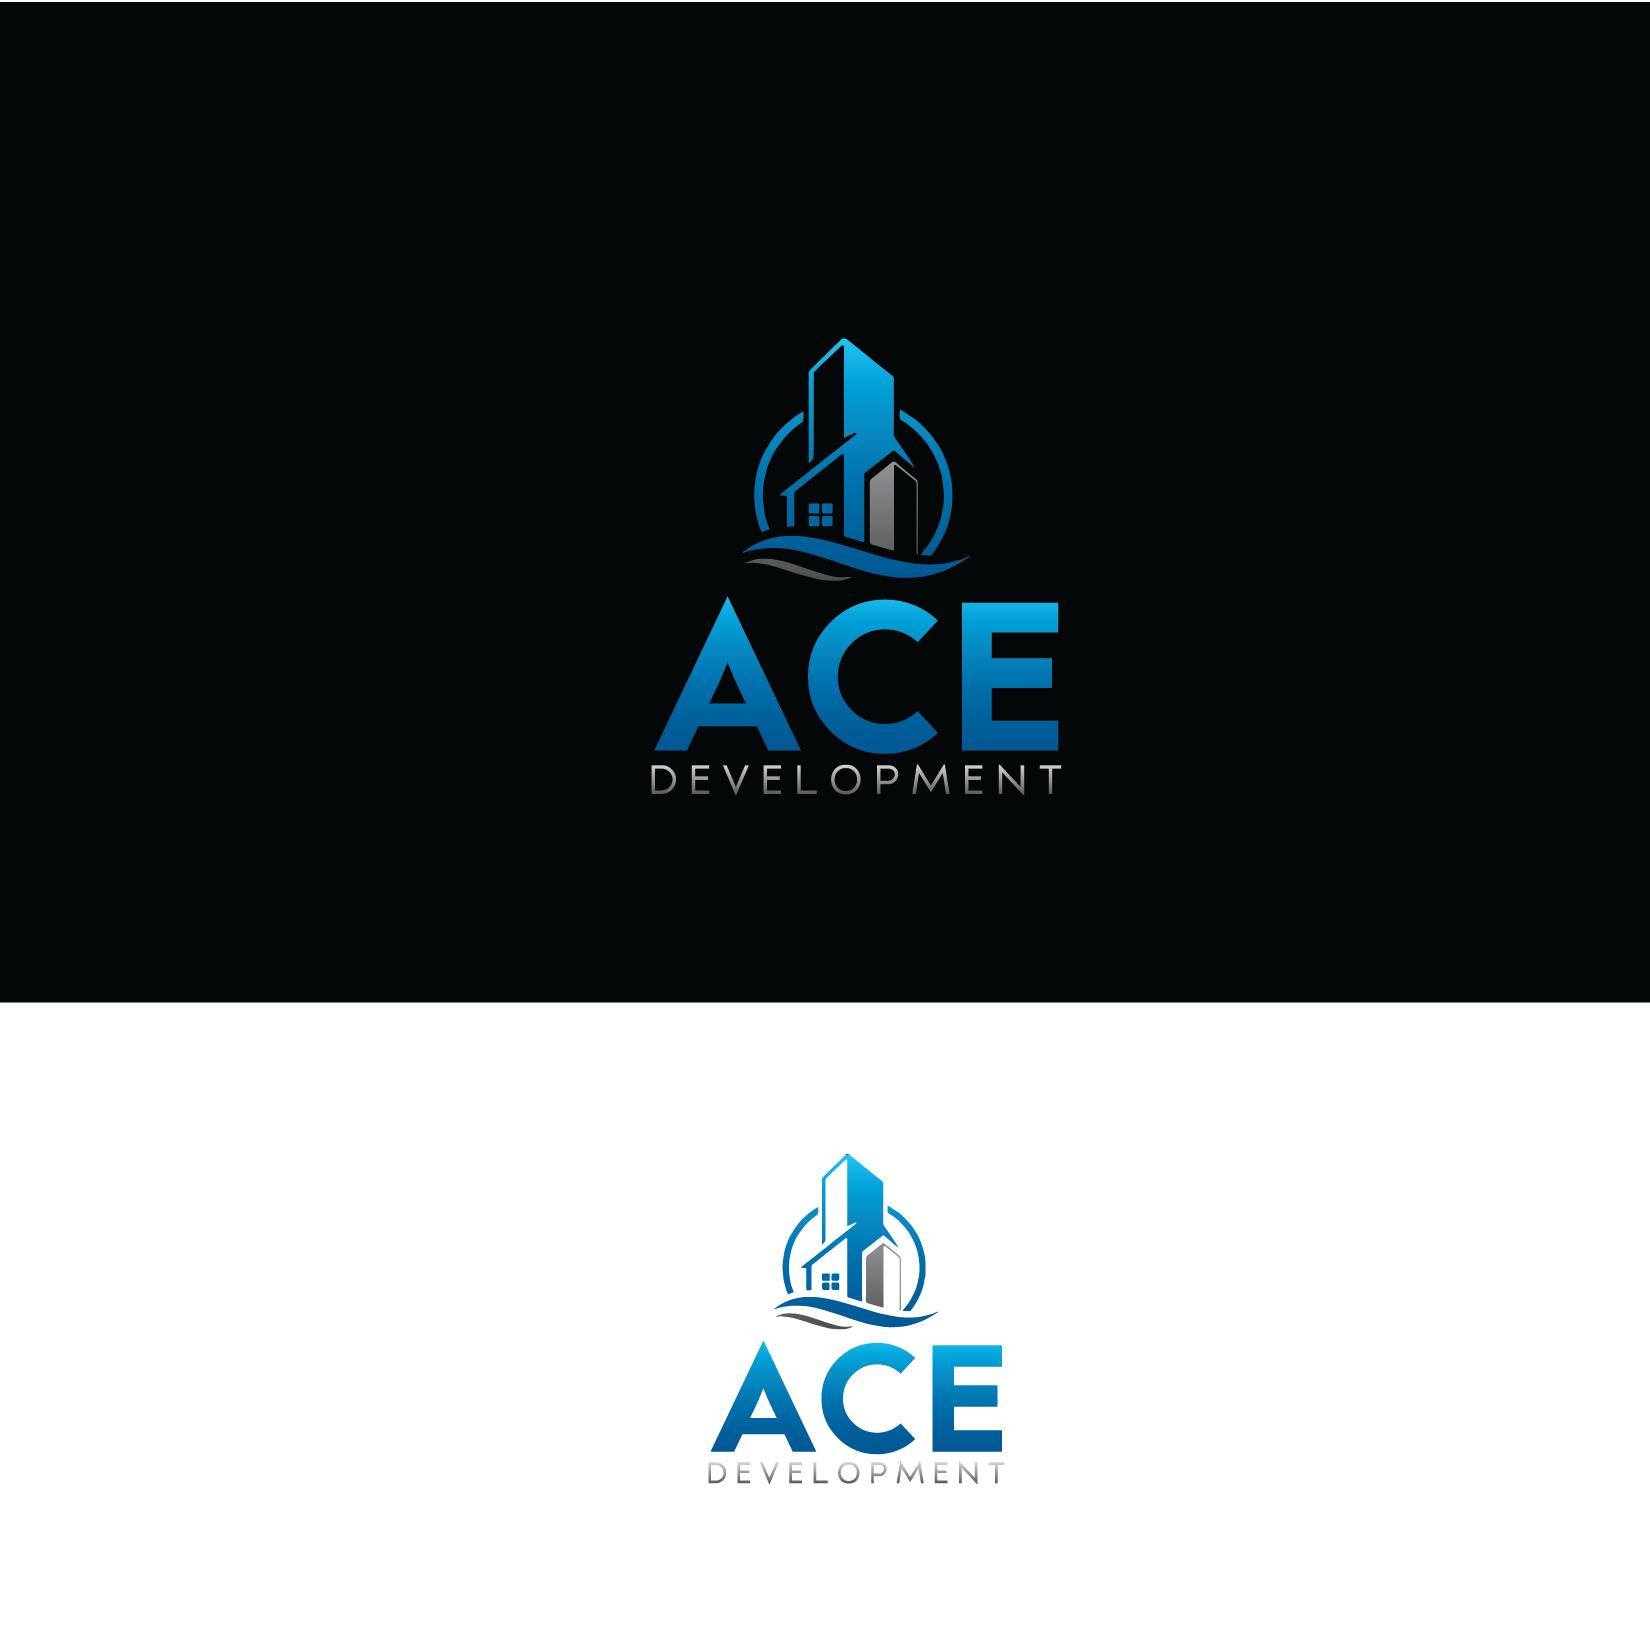 Logo Design by Private User - Entry No. 117 in the Logo Design Contest Fun Logo Design for Ace development.